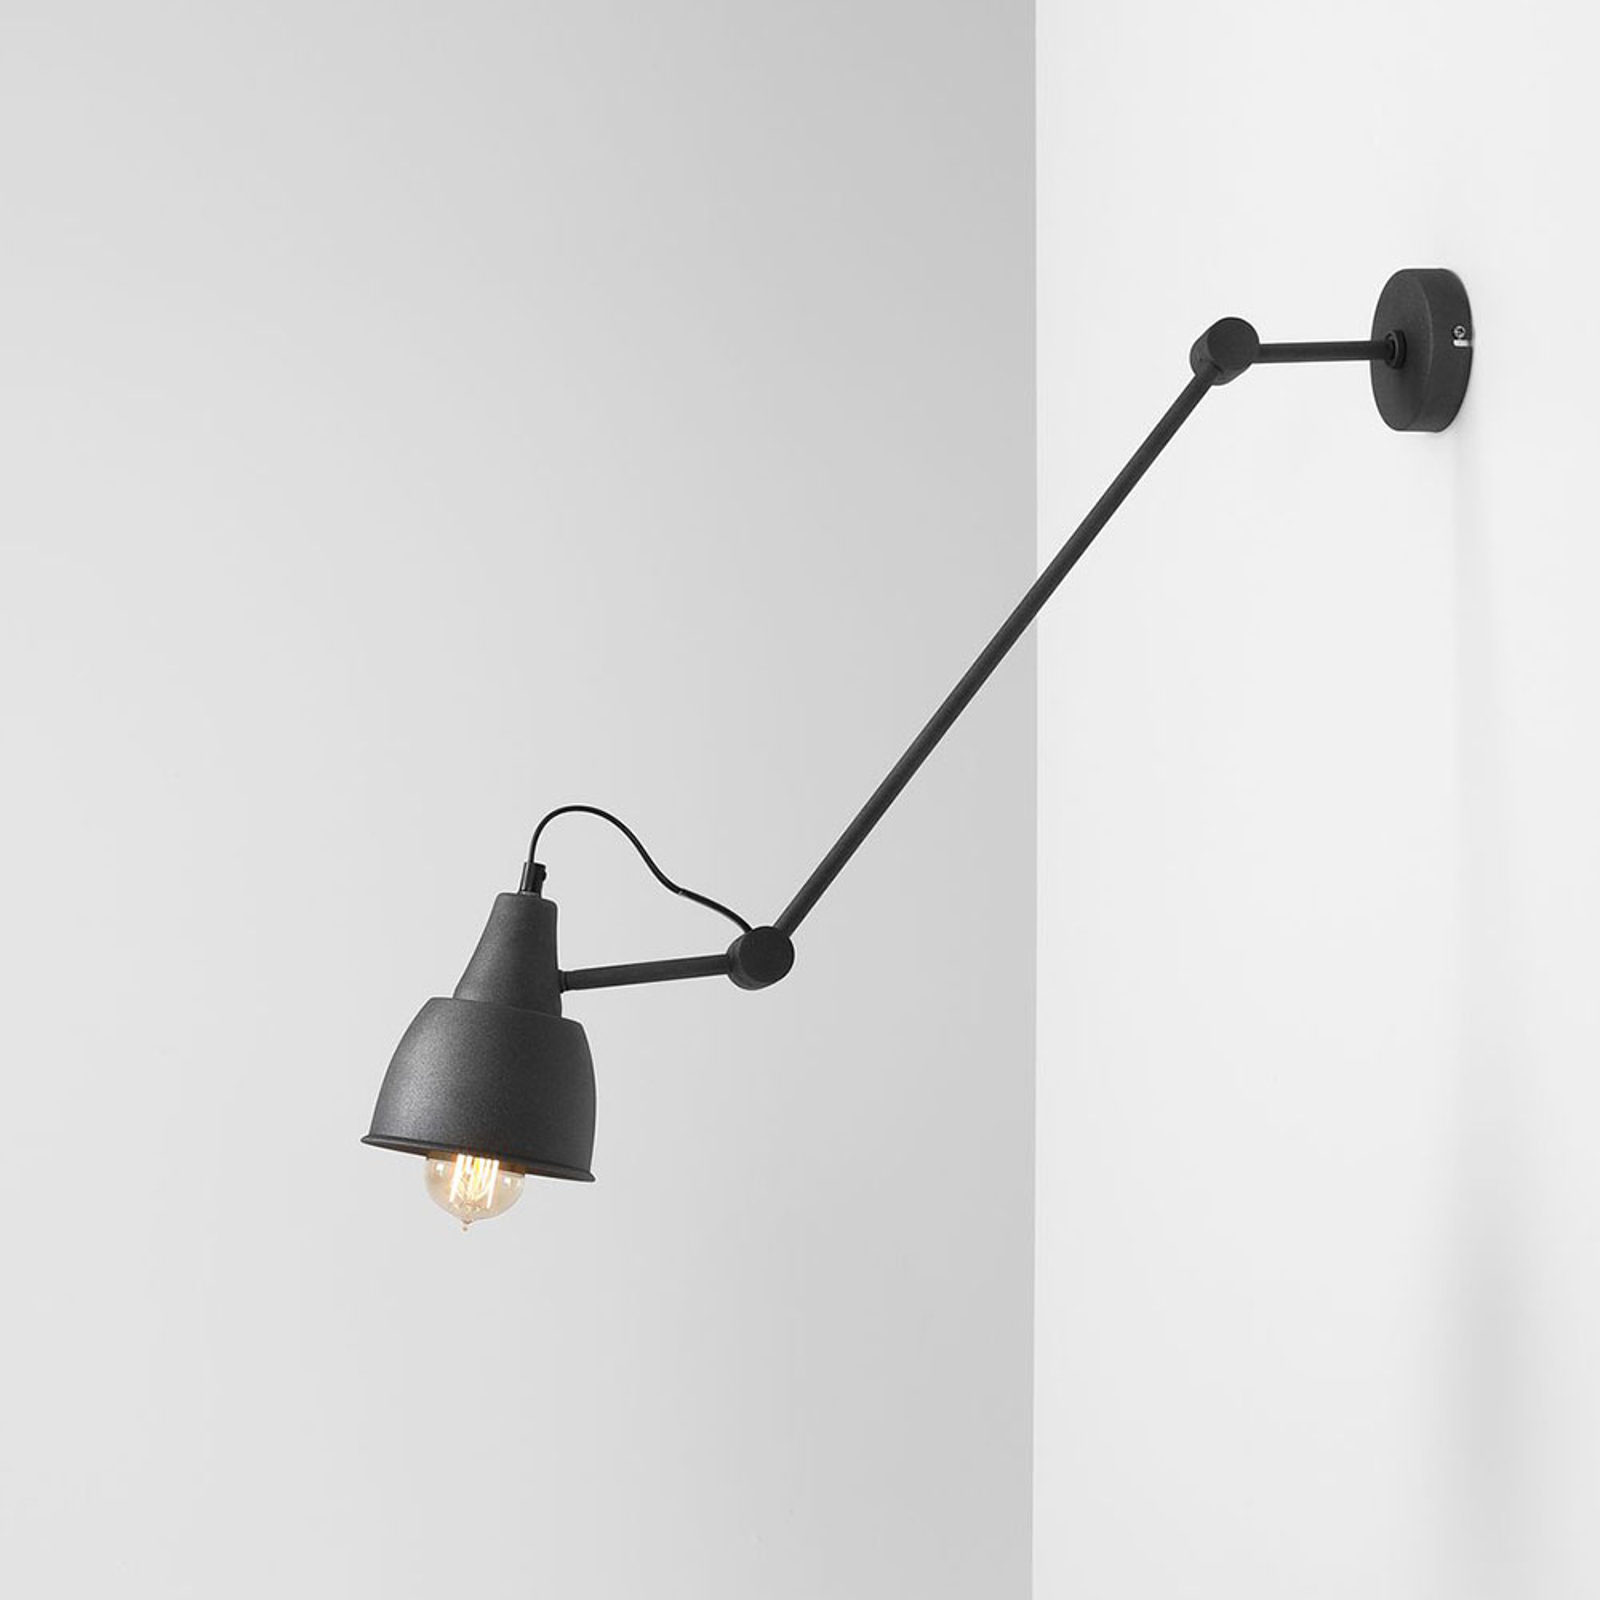 Wandlamp 814, verstelbaar, 1-lamp, grafiet